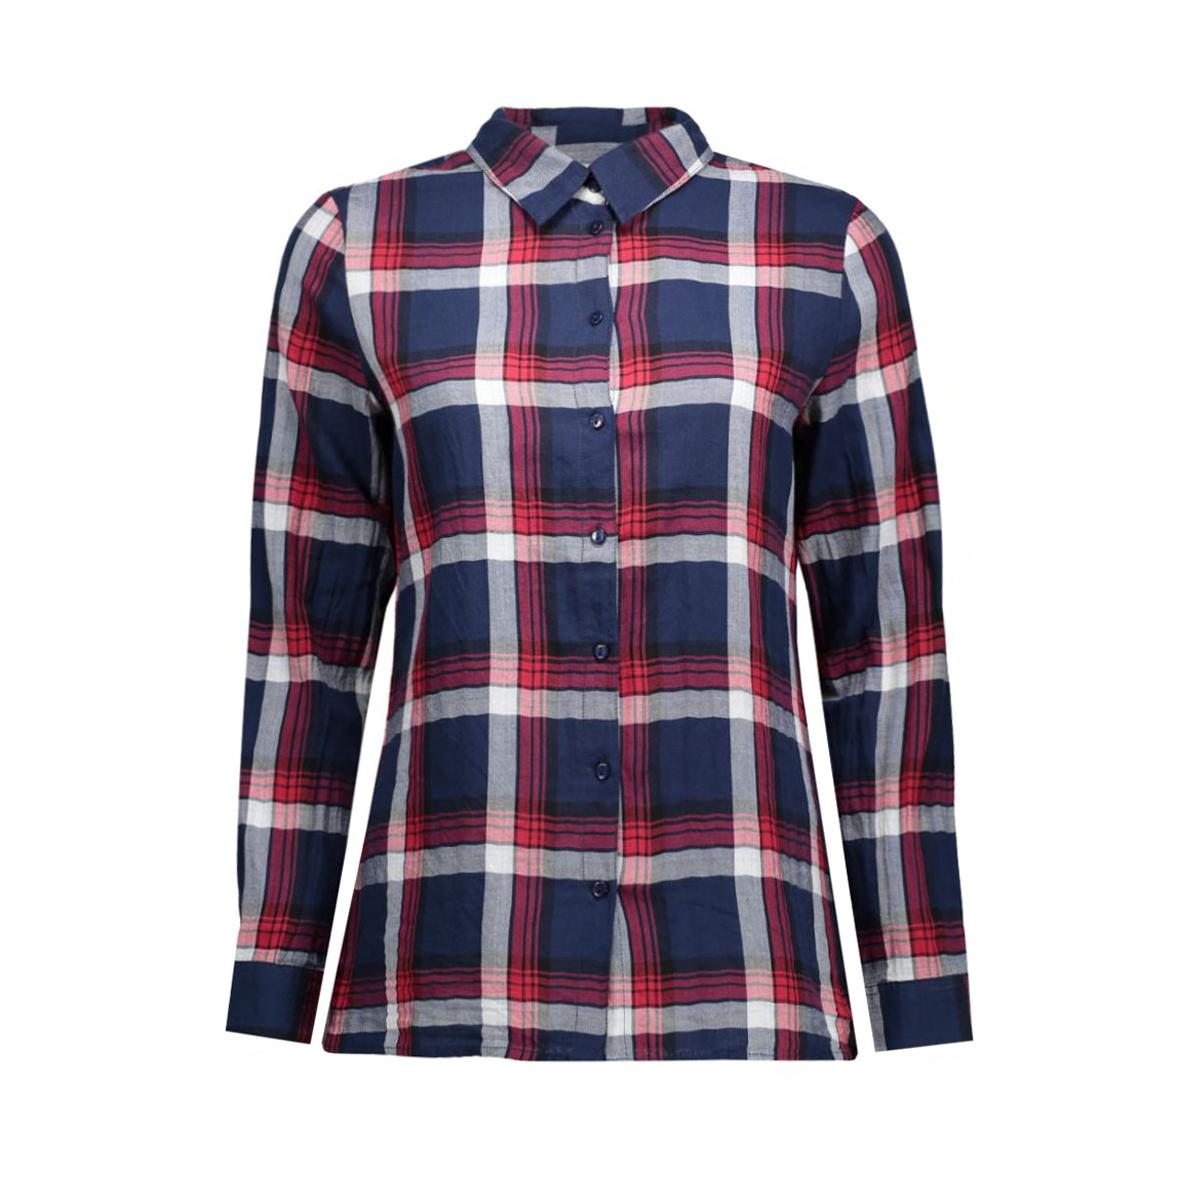 onlstockholm cici l/s shirt noos wv 15109947 only blouse cloud dancer/new red